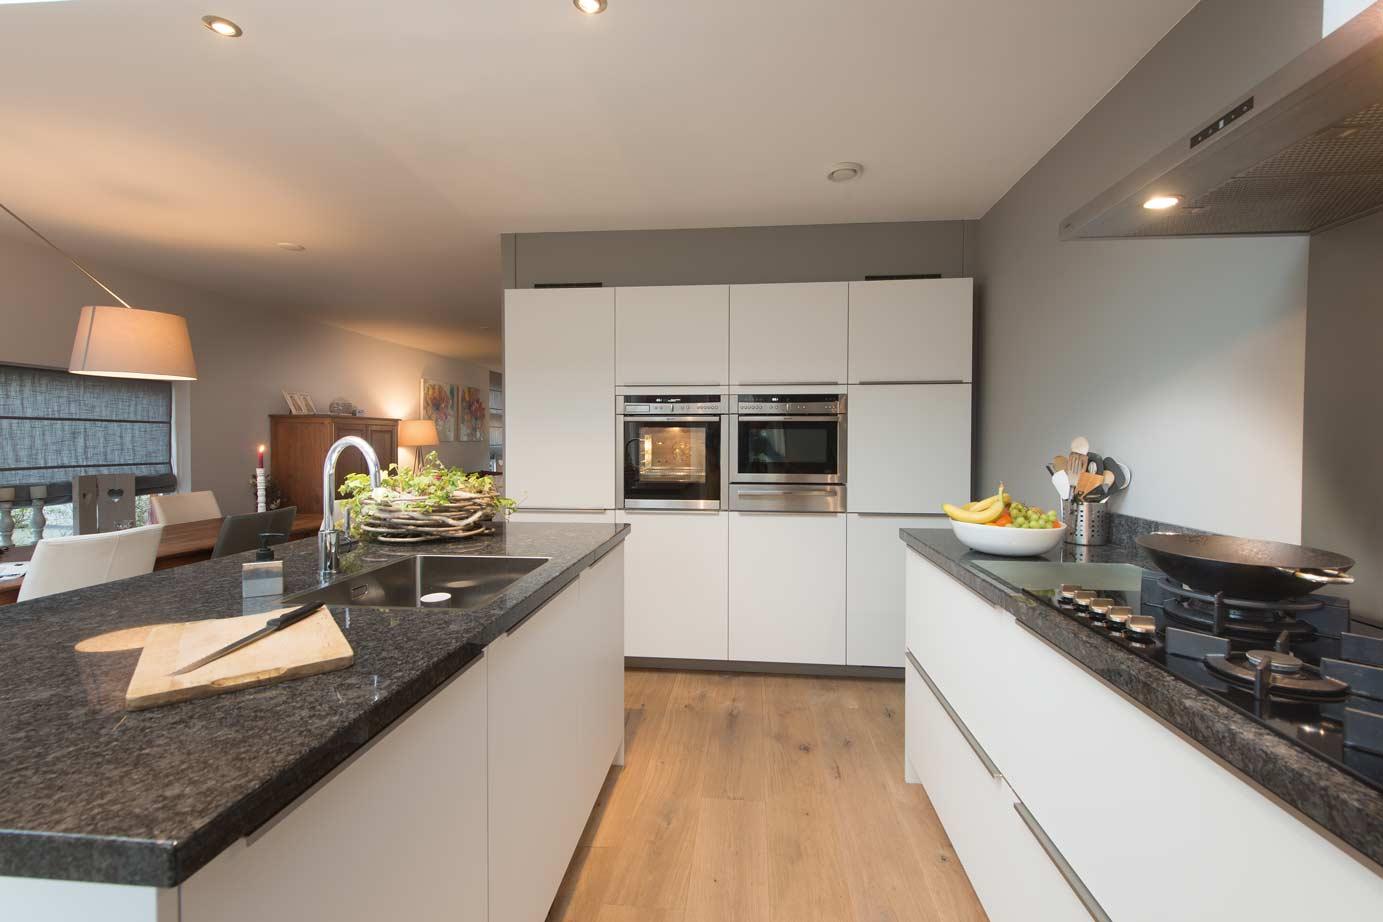 Moderne Keuken Kopen : Keuken Kopen Complete Keukens En Keukenkasten Bij Review Ebooks